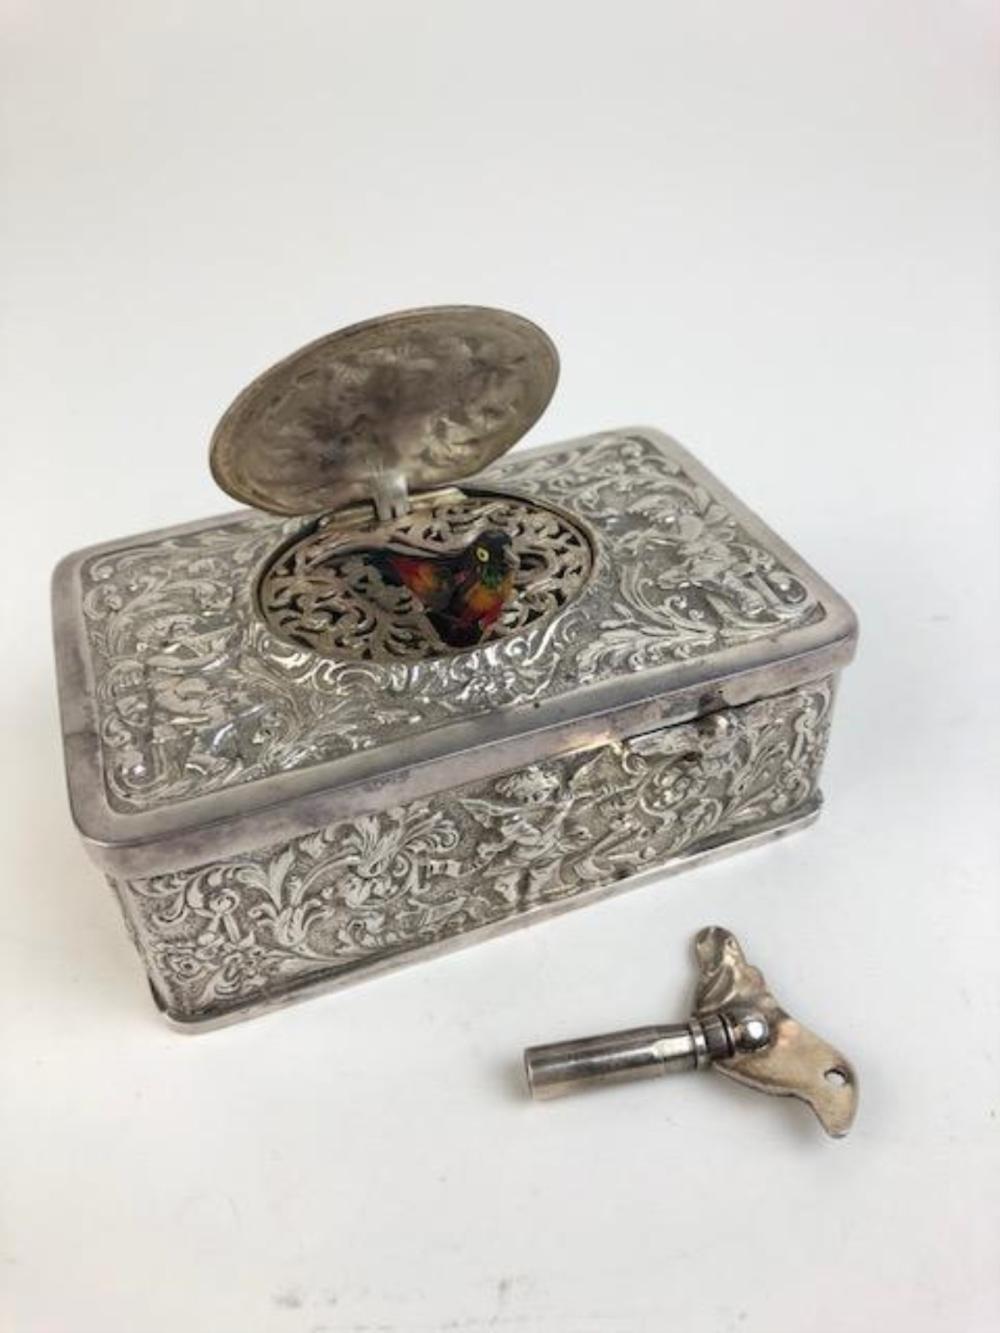 Silver mechanical singing bird box. When the slid bar is slid the lid raises an